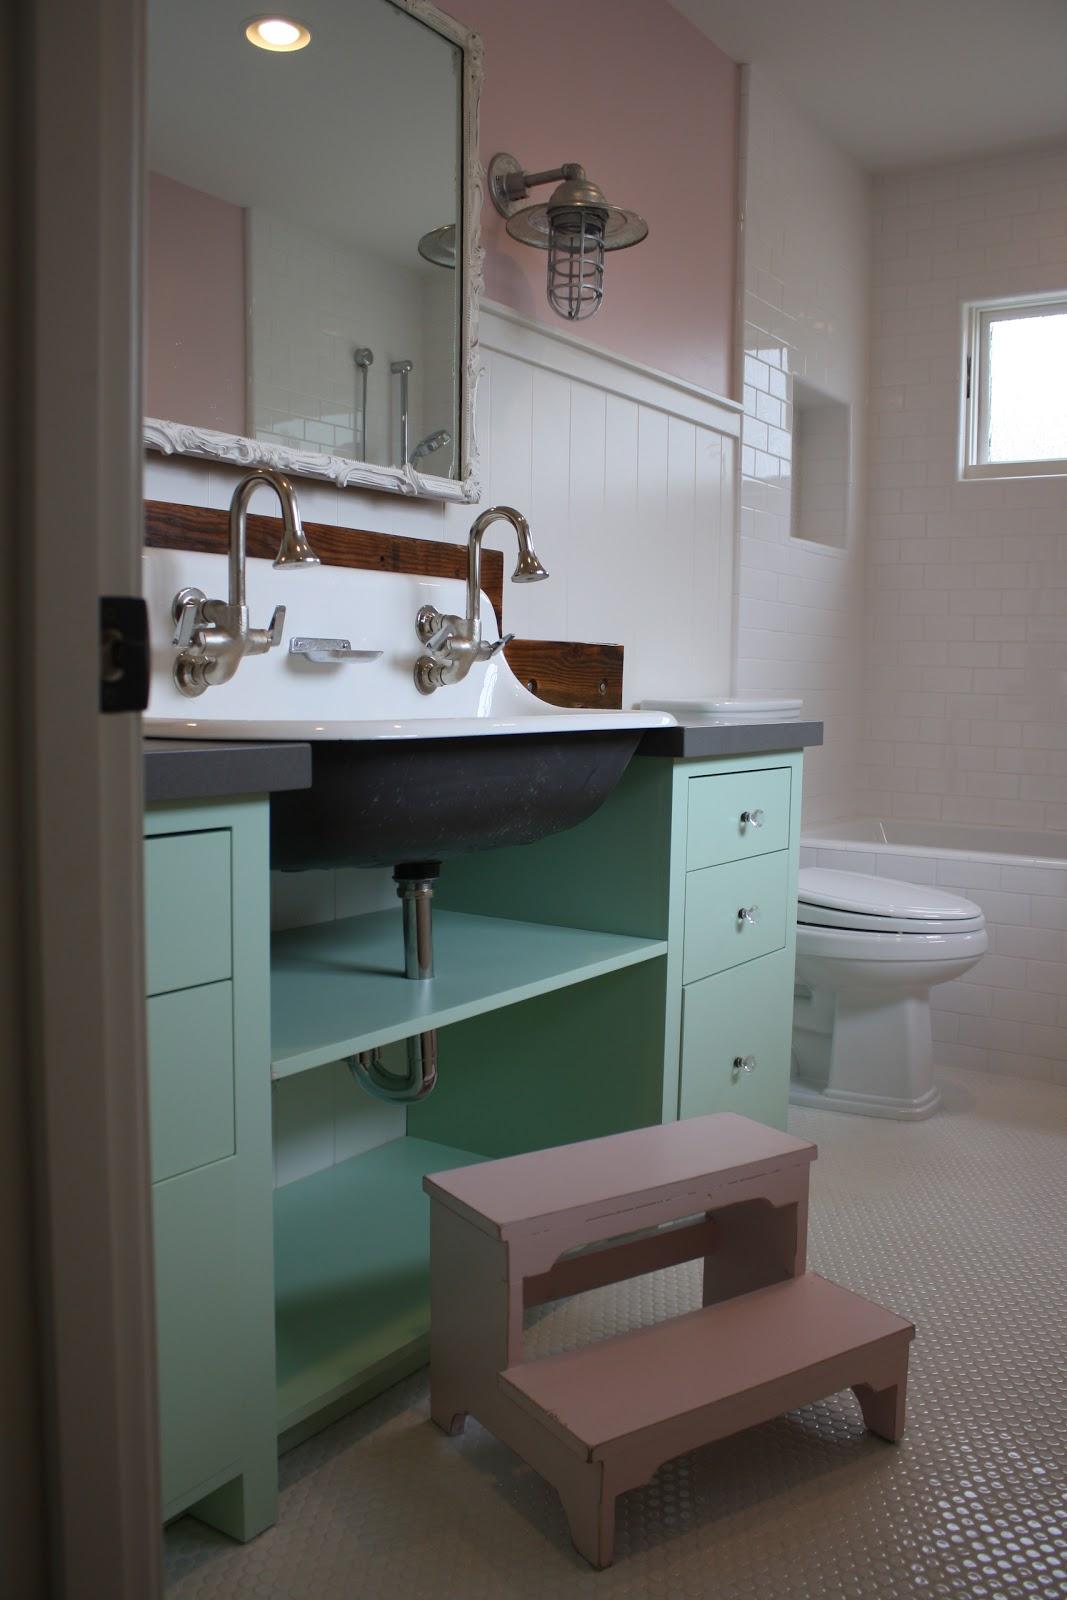 Rustic Rooster Interiors Little Girls Bathroom Interior